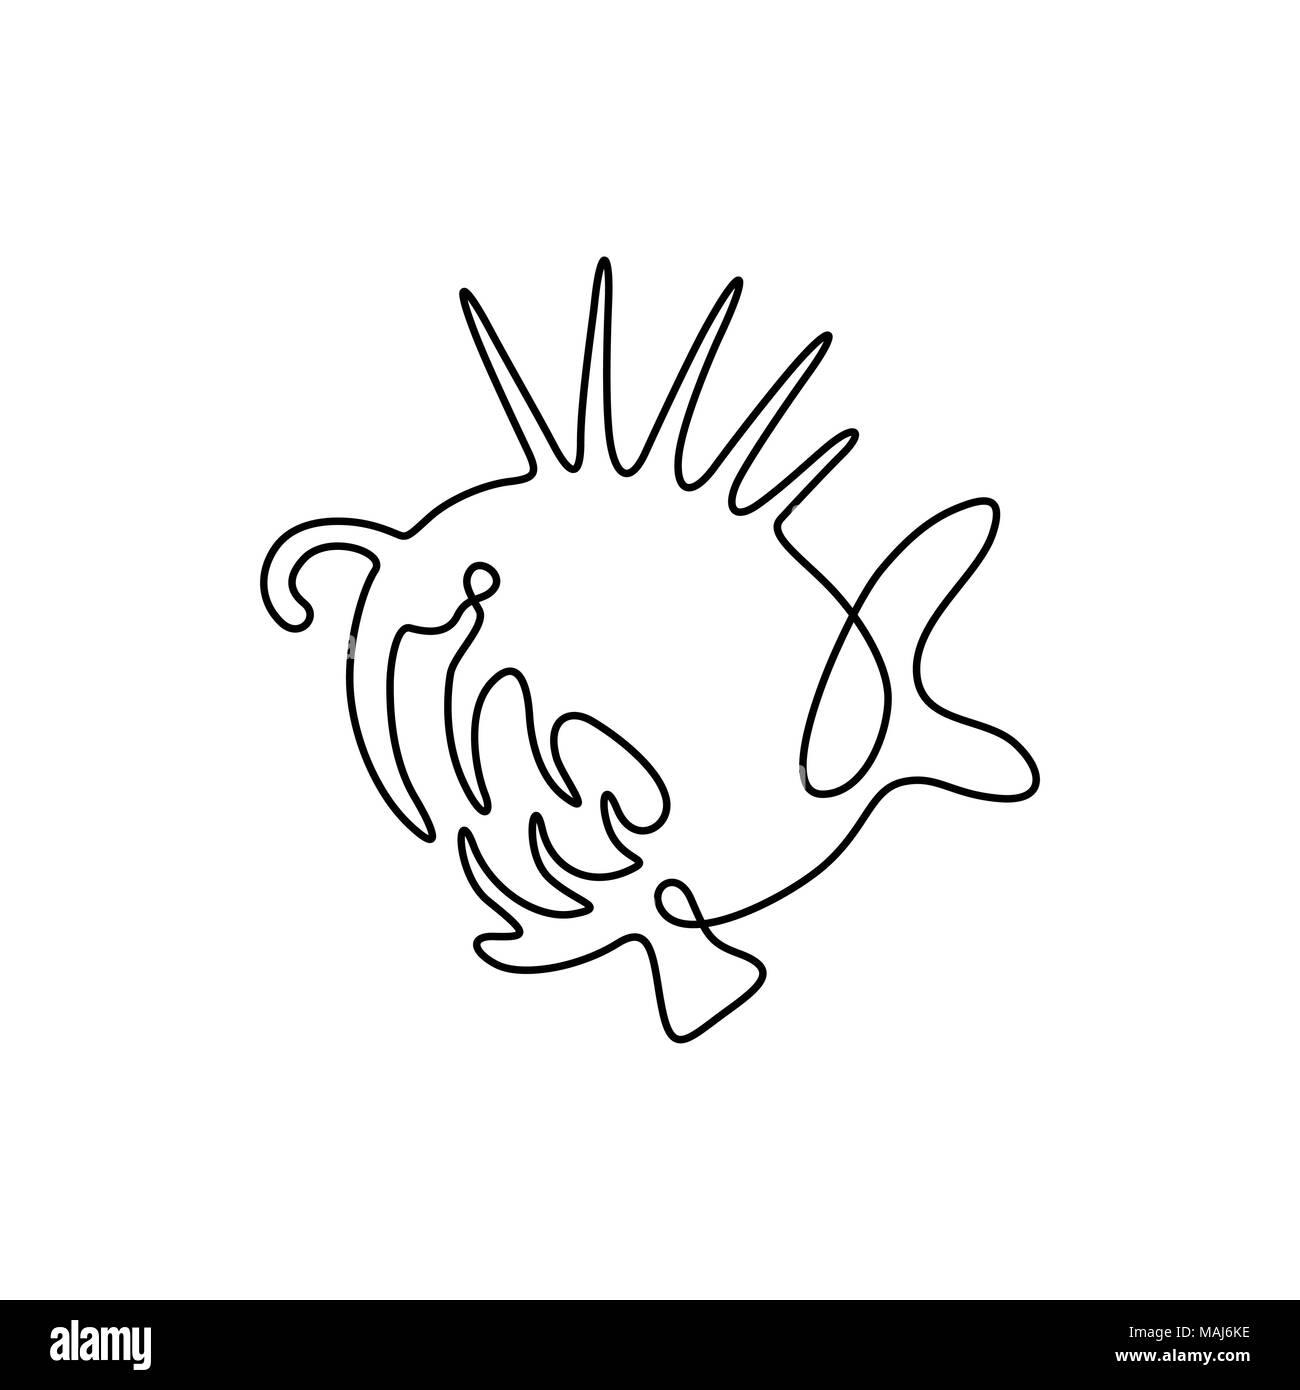 Vector continuous line drawing fish fish logo predator angler logotype one line art design